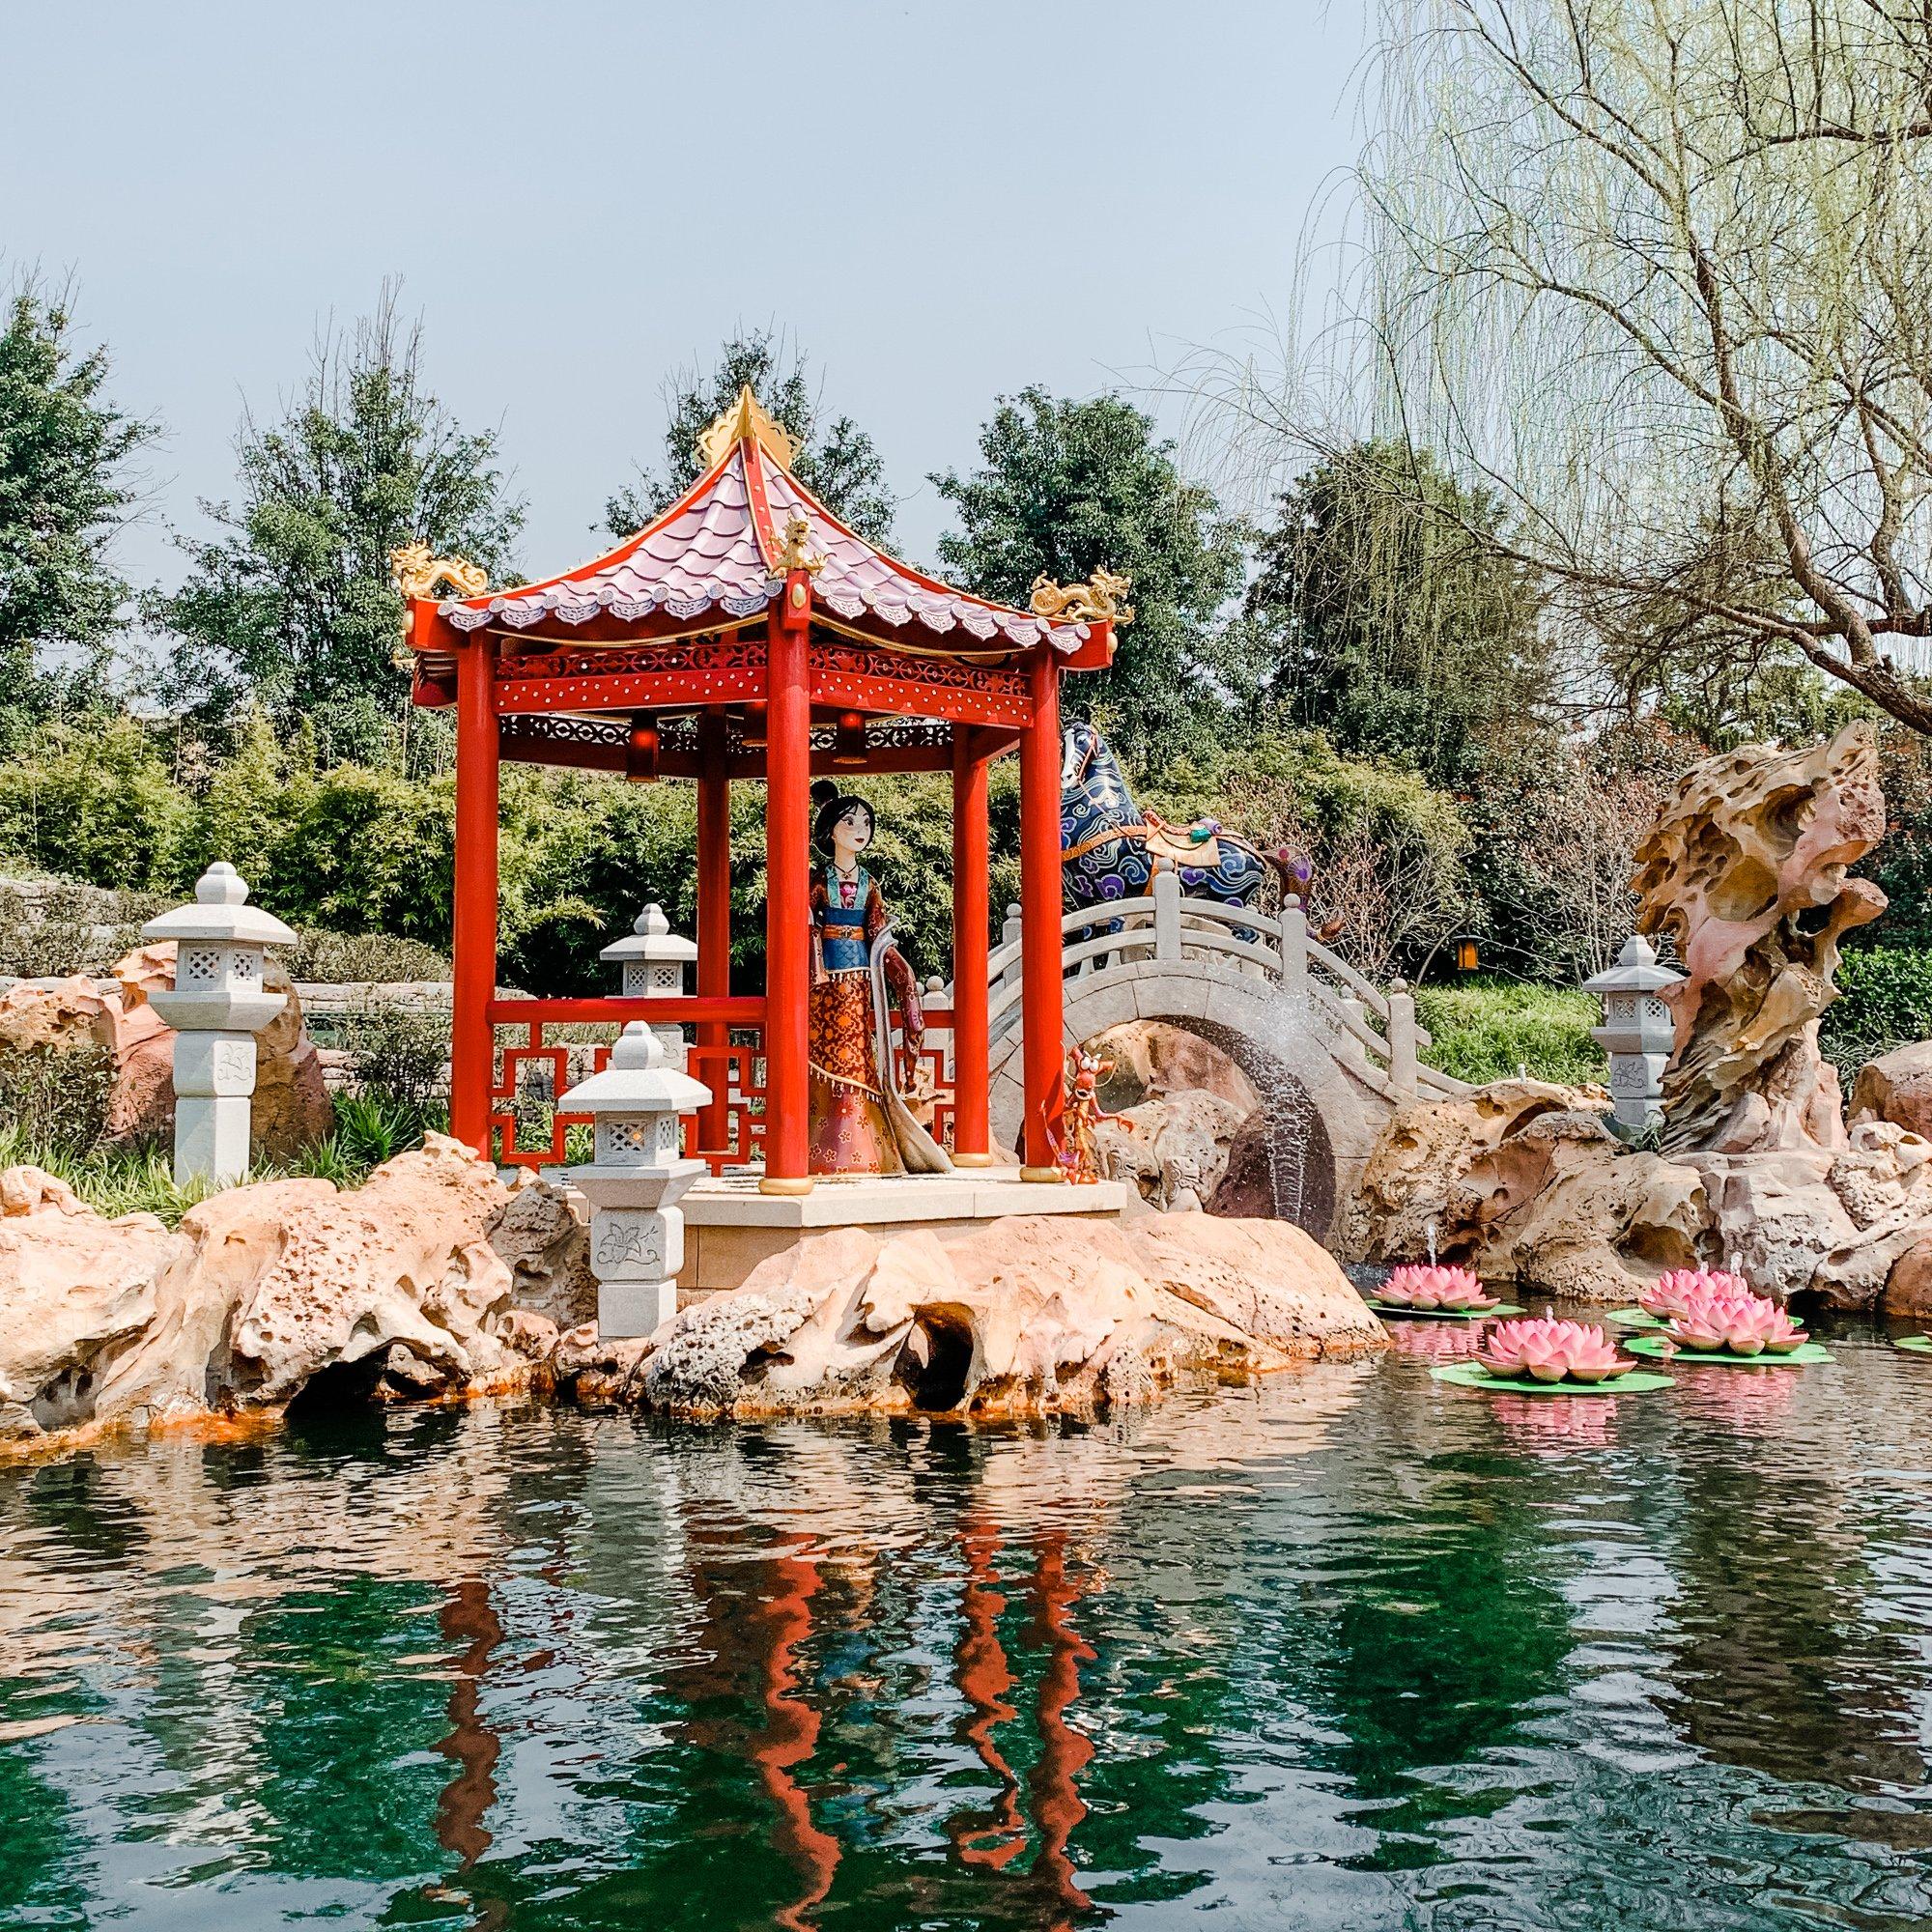 Mulan display on Voyage to the Crystal Grotto in Fantasyland